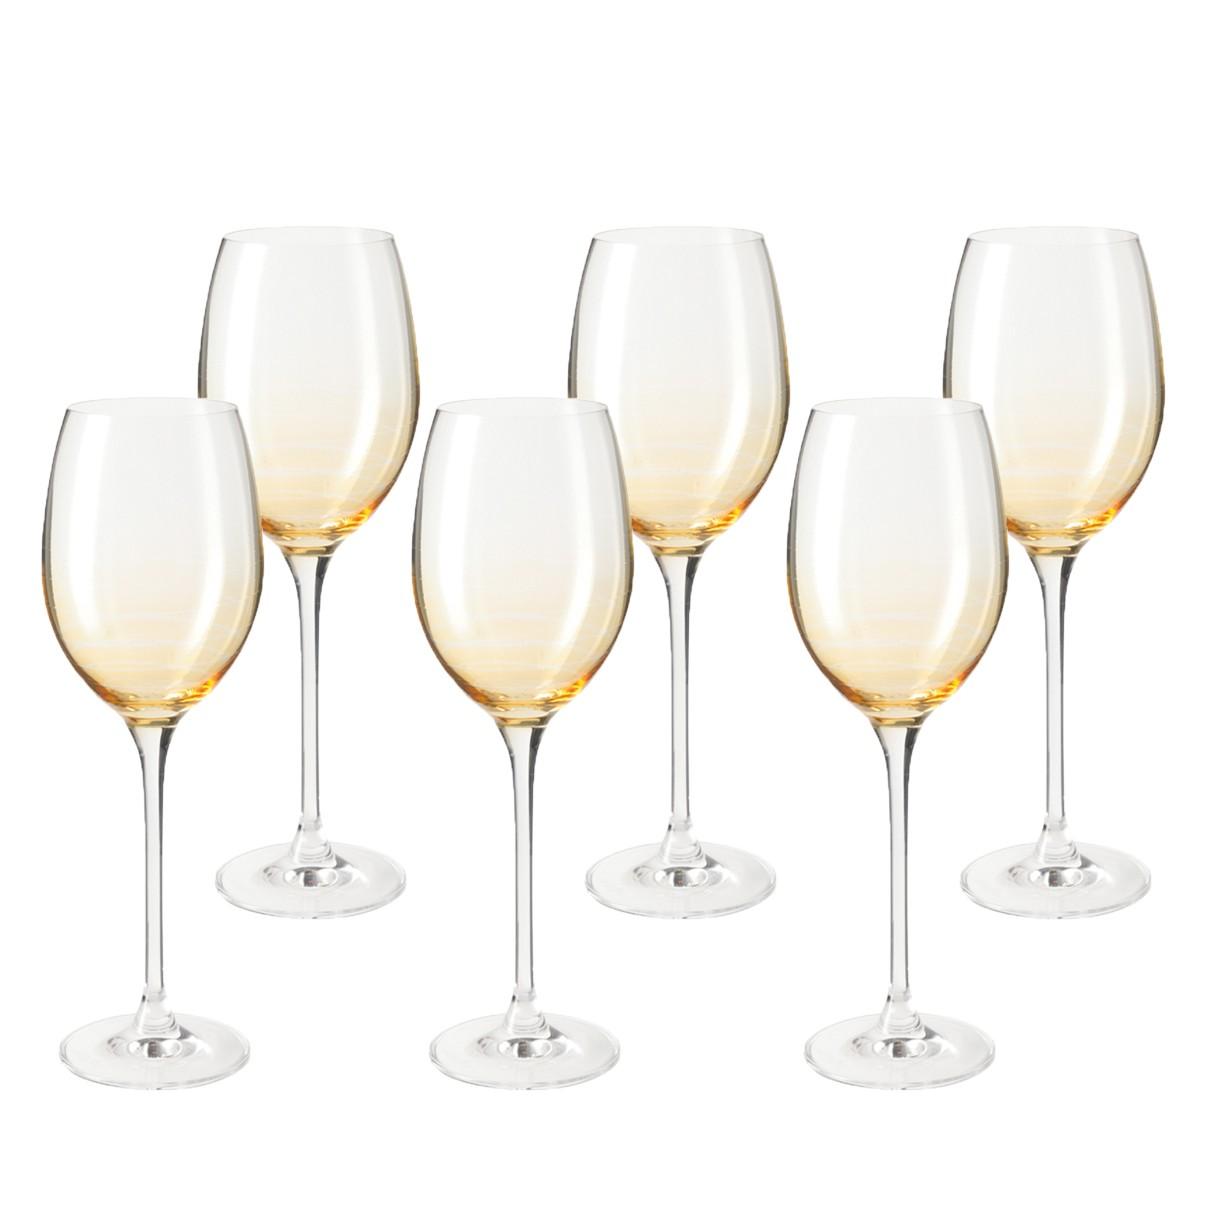 Weinglas Cheers (6er-Set) - Gelb, Leonardo